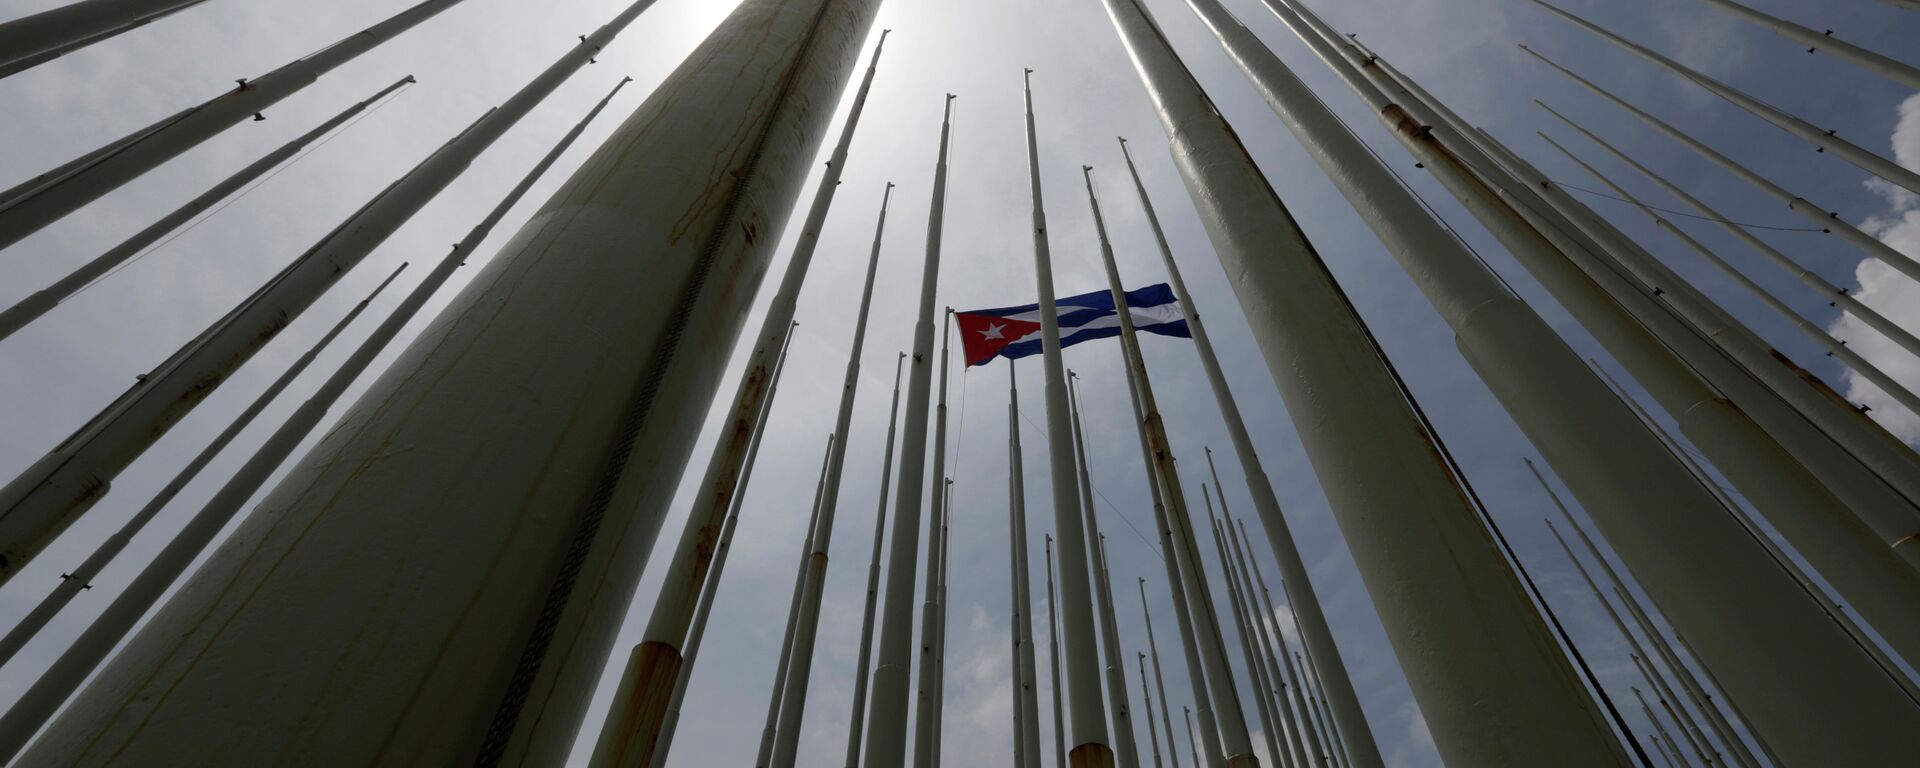 Bandera de Cuba frente de la embajada de EEUU en La Habana - Sputnik Mundo, 1920, 09.06.2021